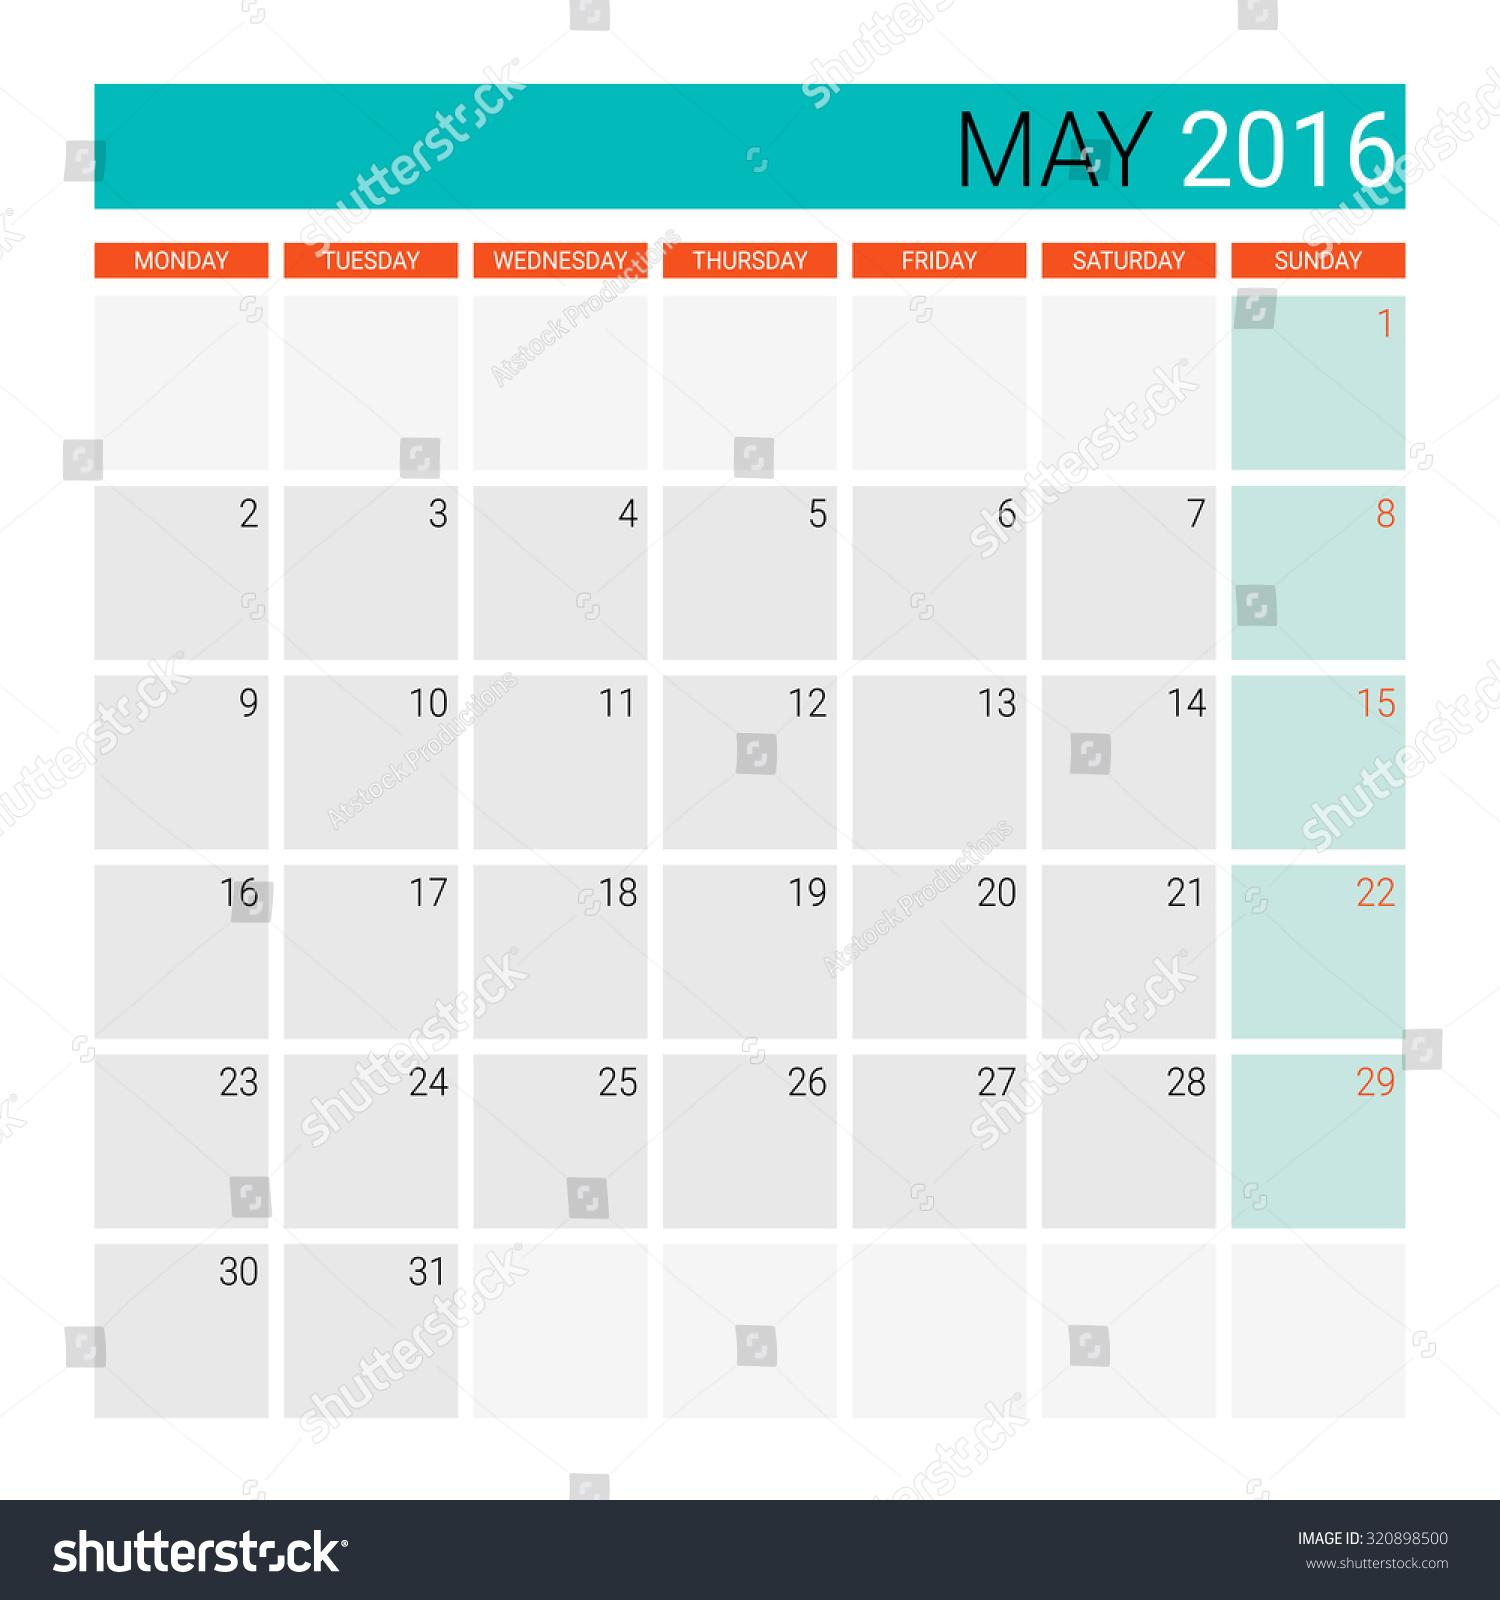 May Calendar Vector : May calendar or desk planner stock vector